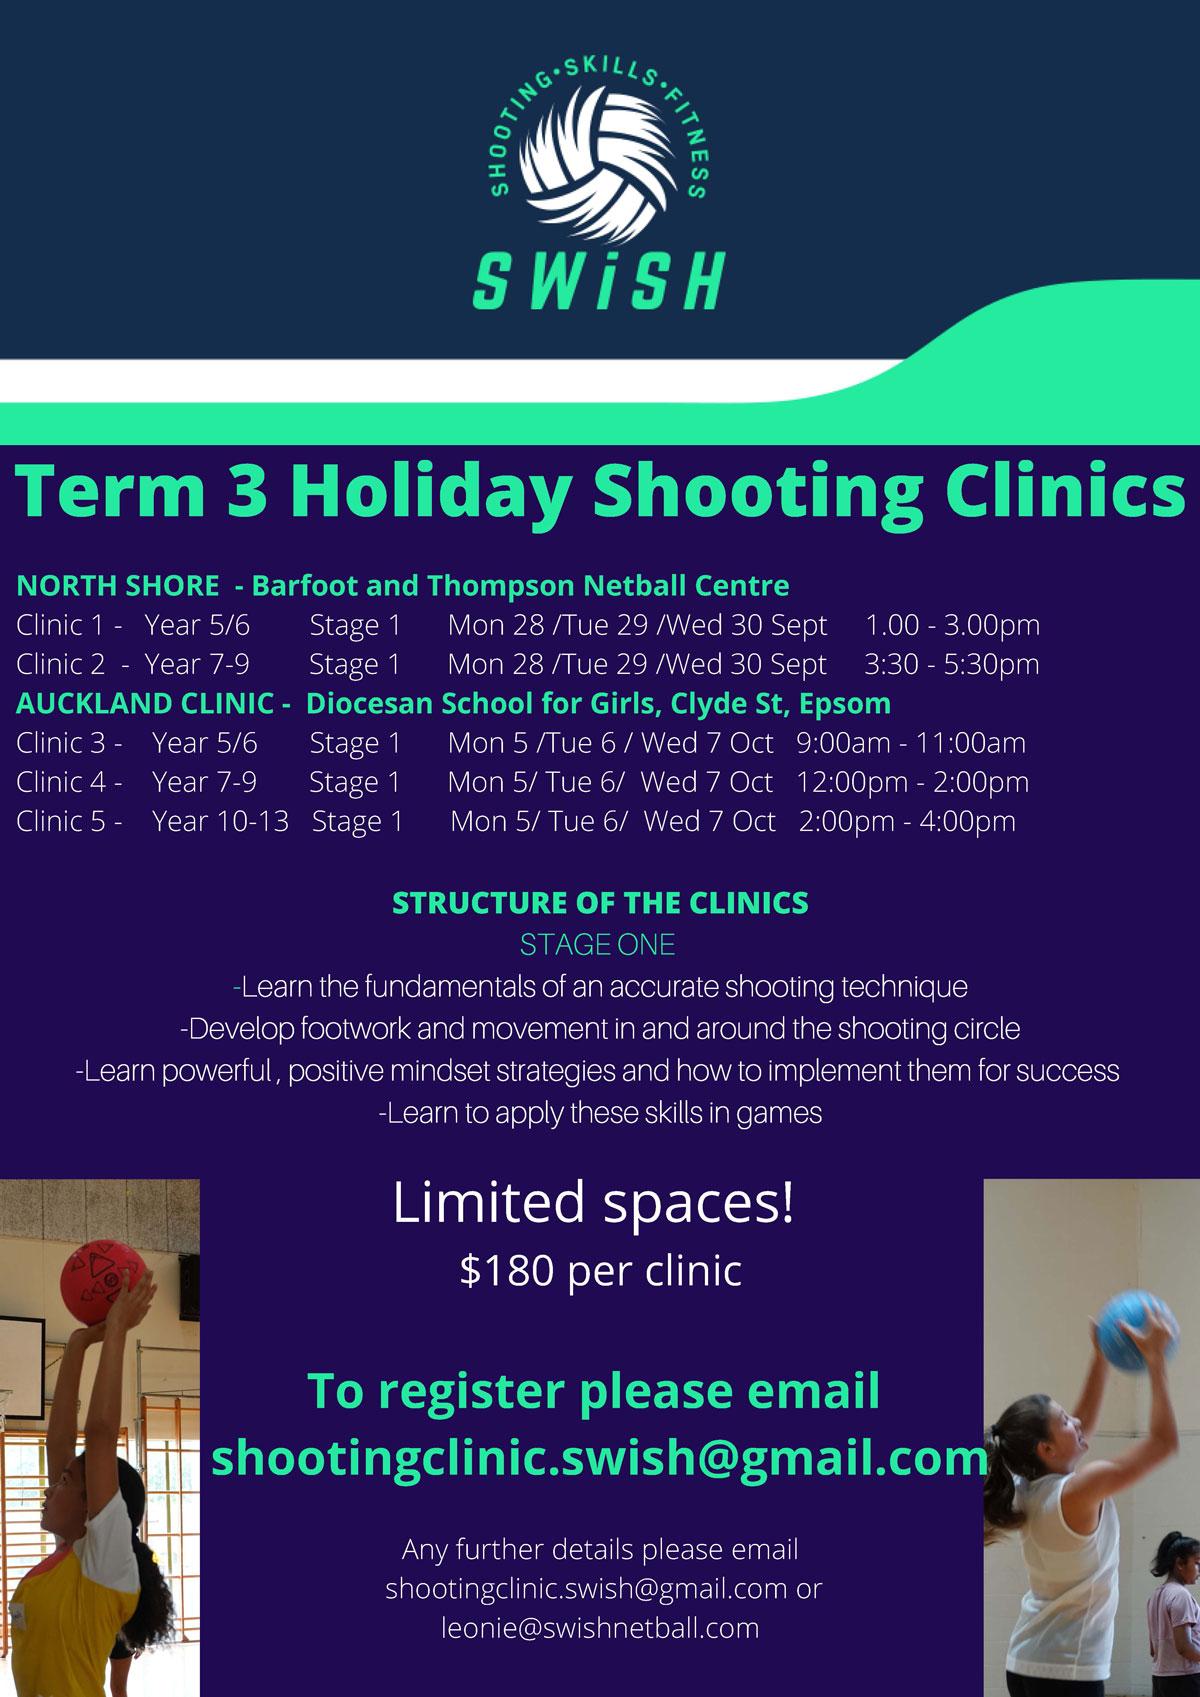 SWISH – Term 3 Holiday Shooting Clinics